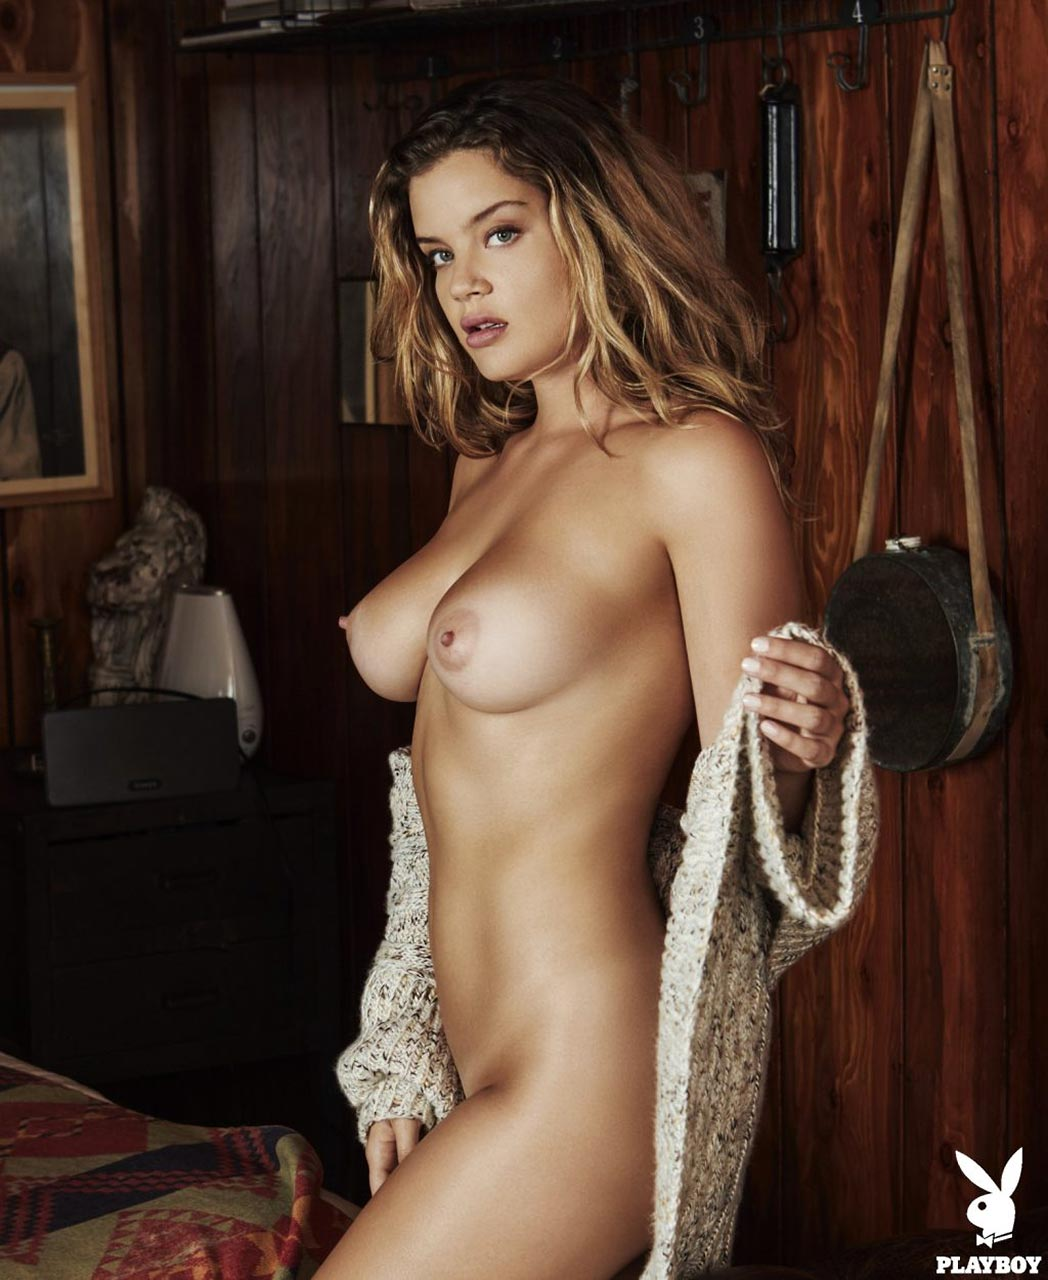 Naked playboy